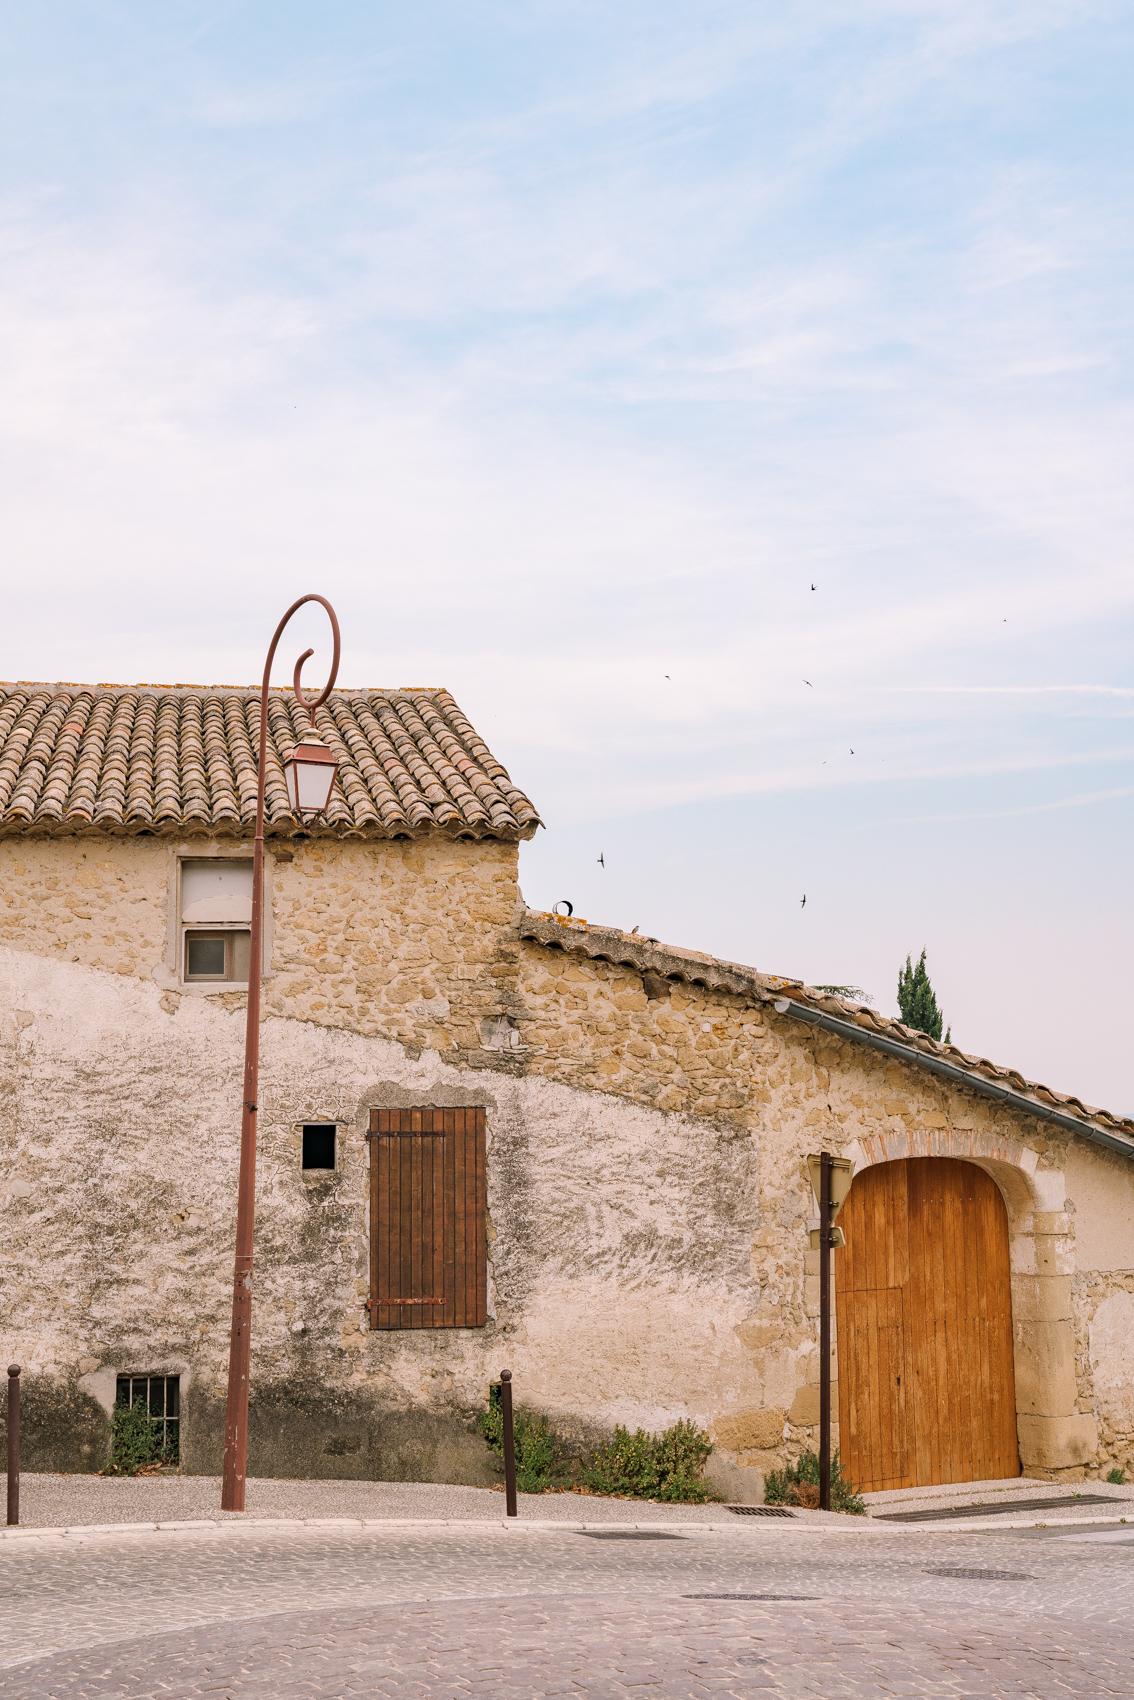 TRAVEL-Photography-provence-Vaugines-luberon-Clara-Tuma.jpg